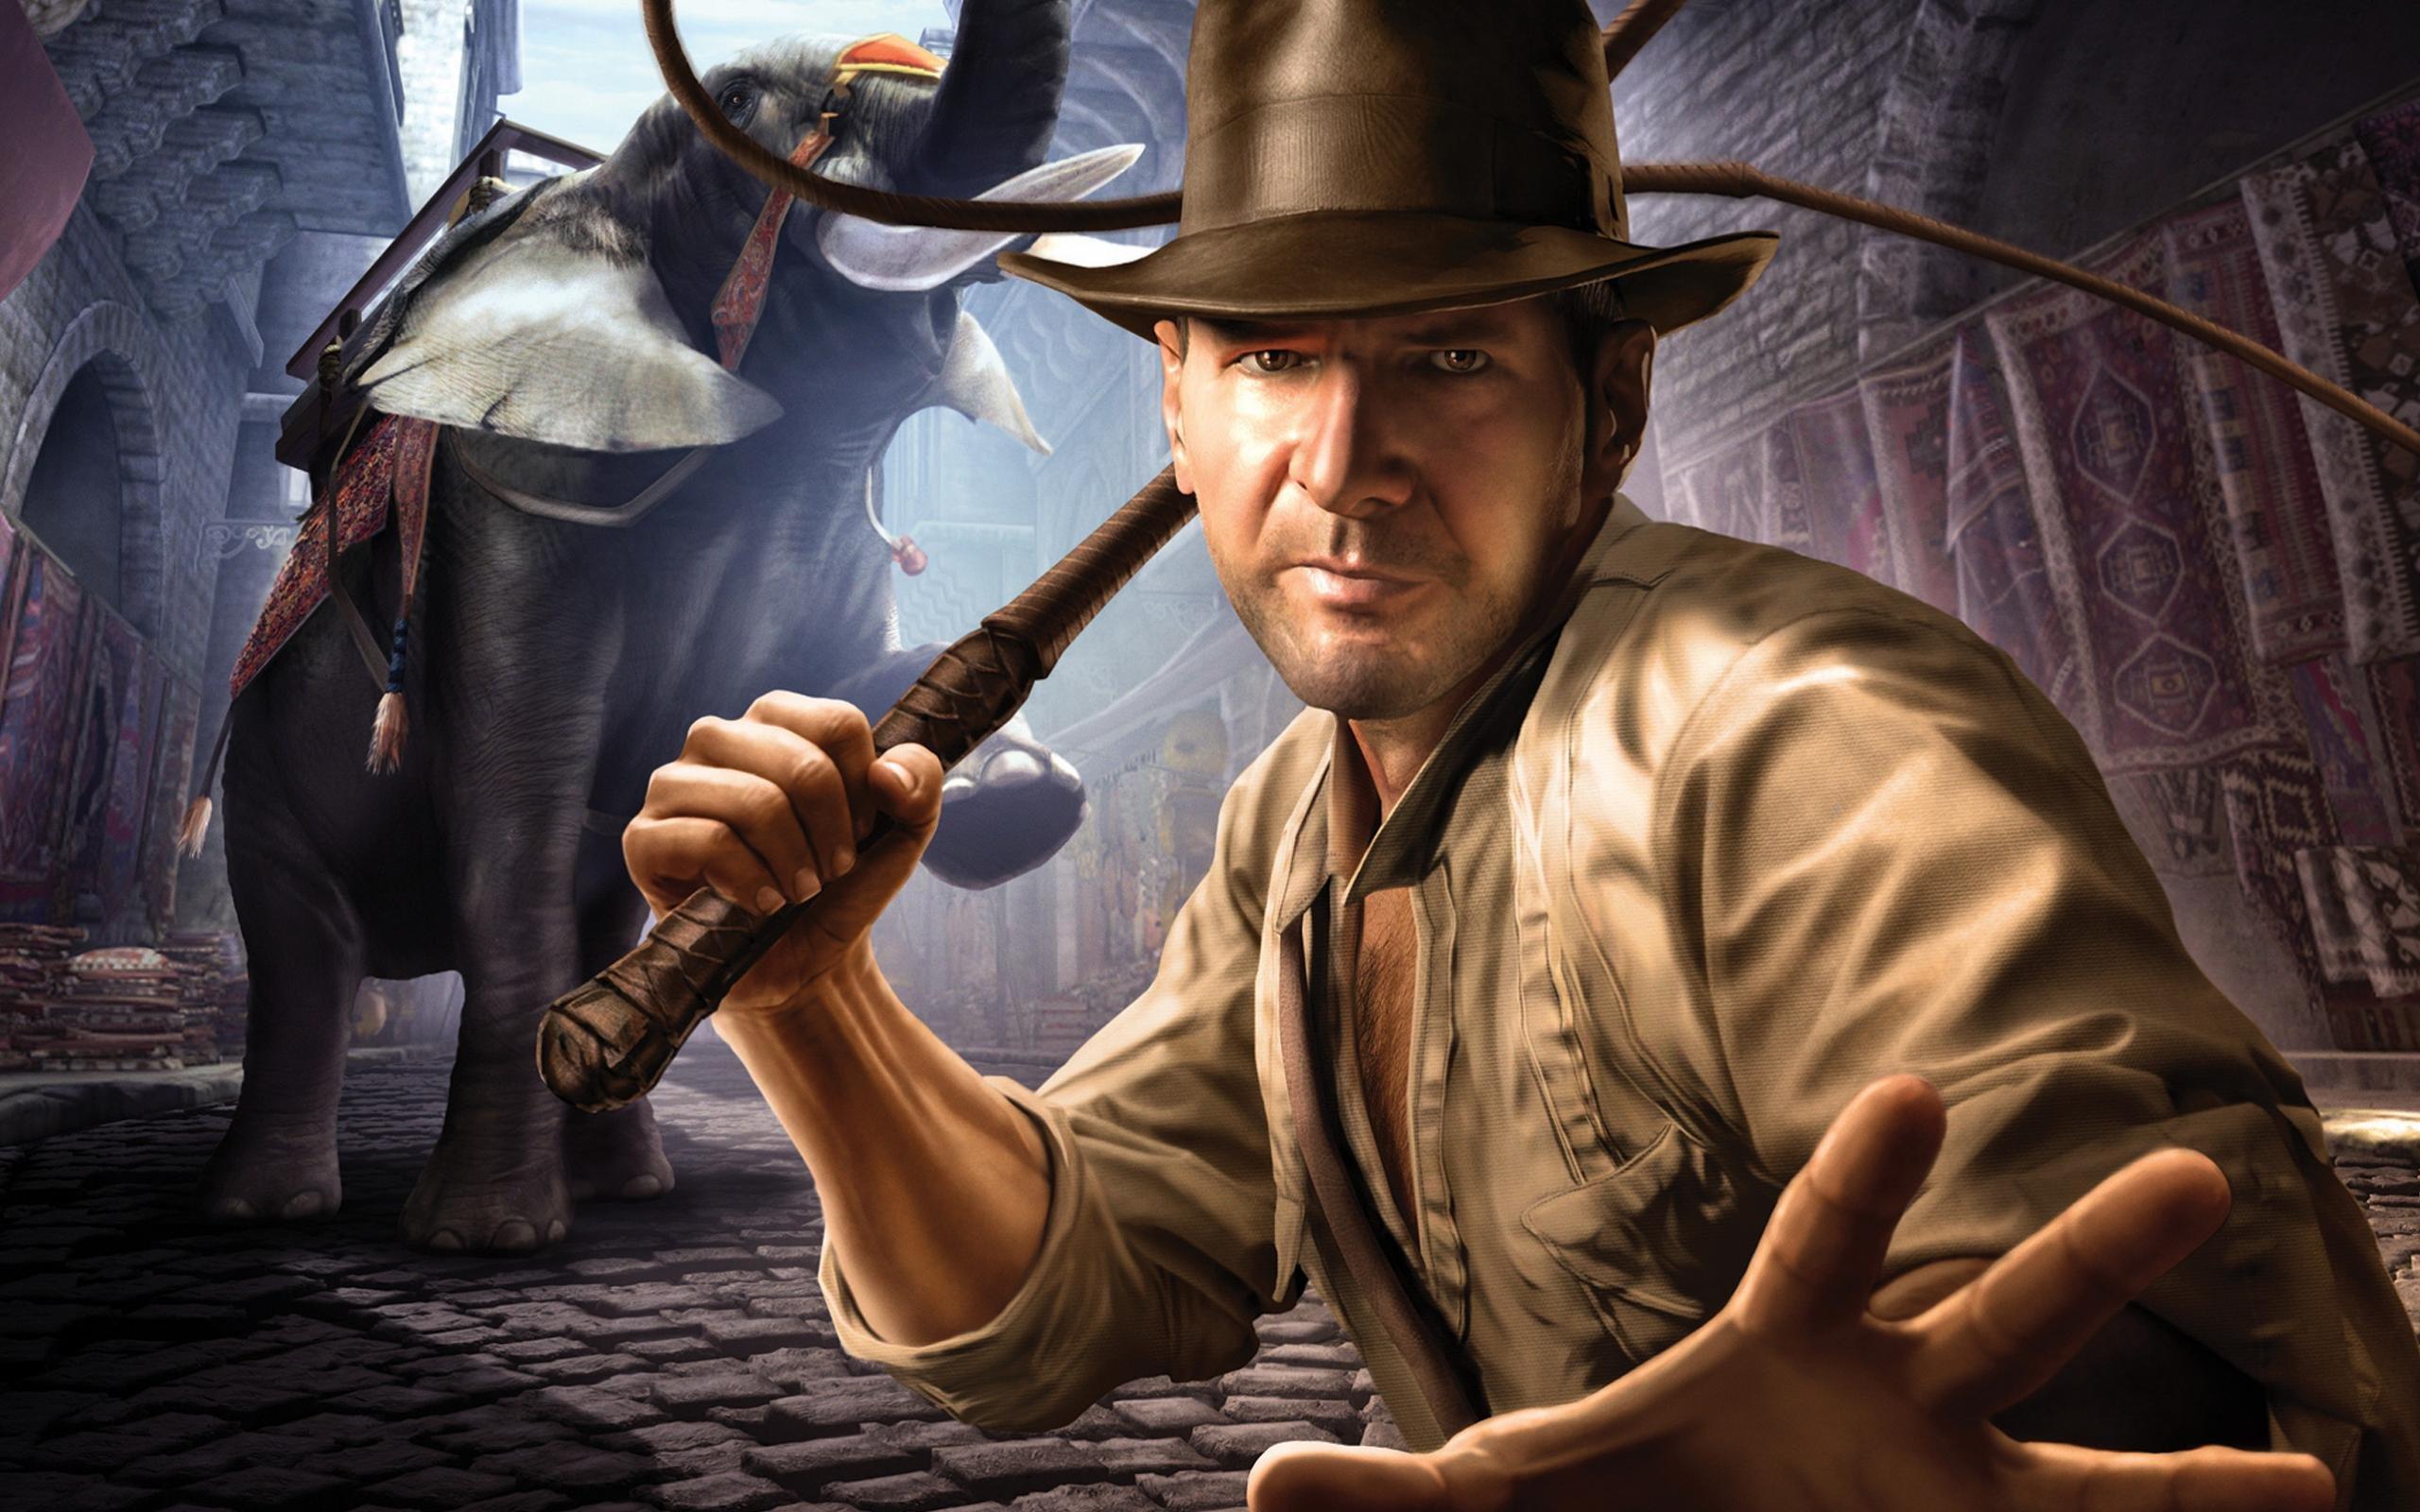 Download Hd 2560x1600 Indiana Jones Desktop Background ID282989 For Free